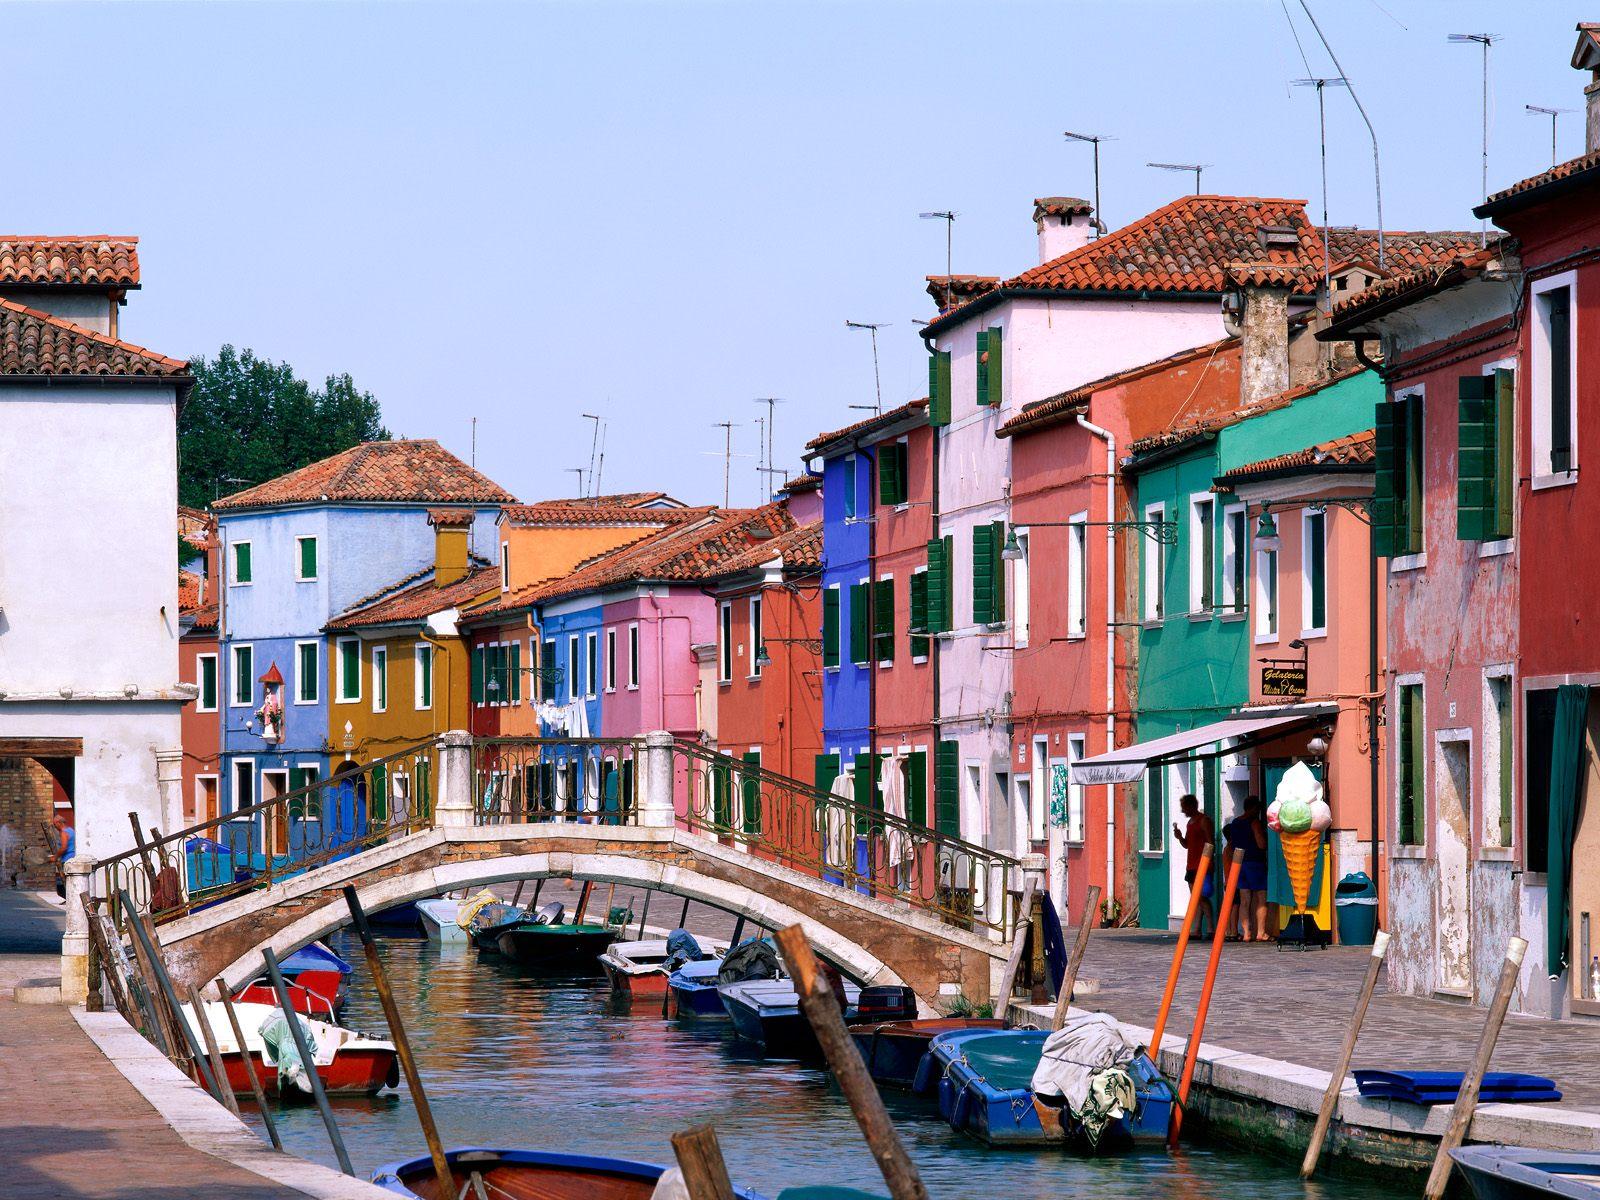 Cities in World: Venice Italy